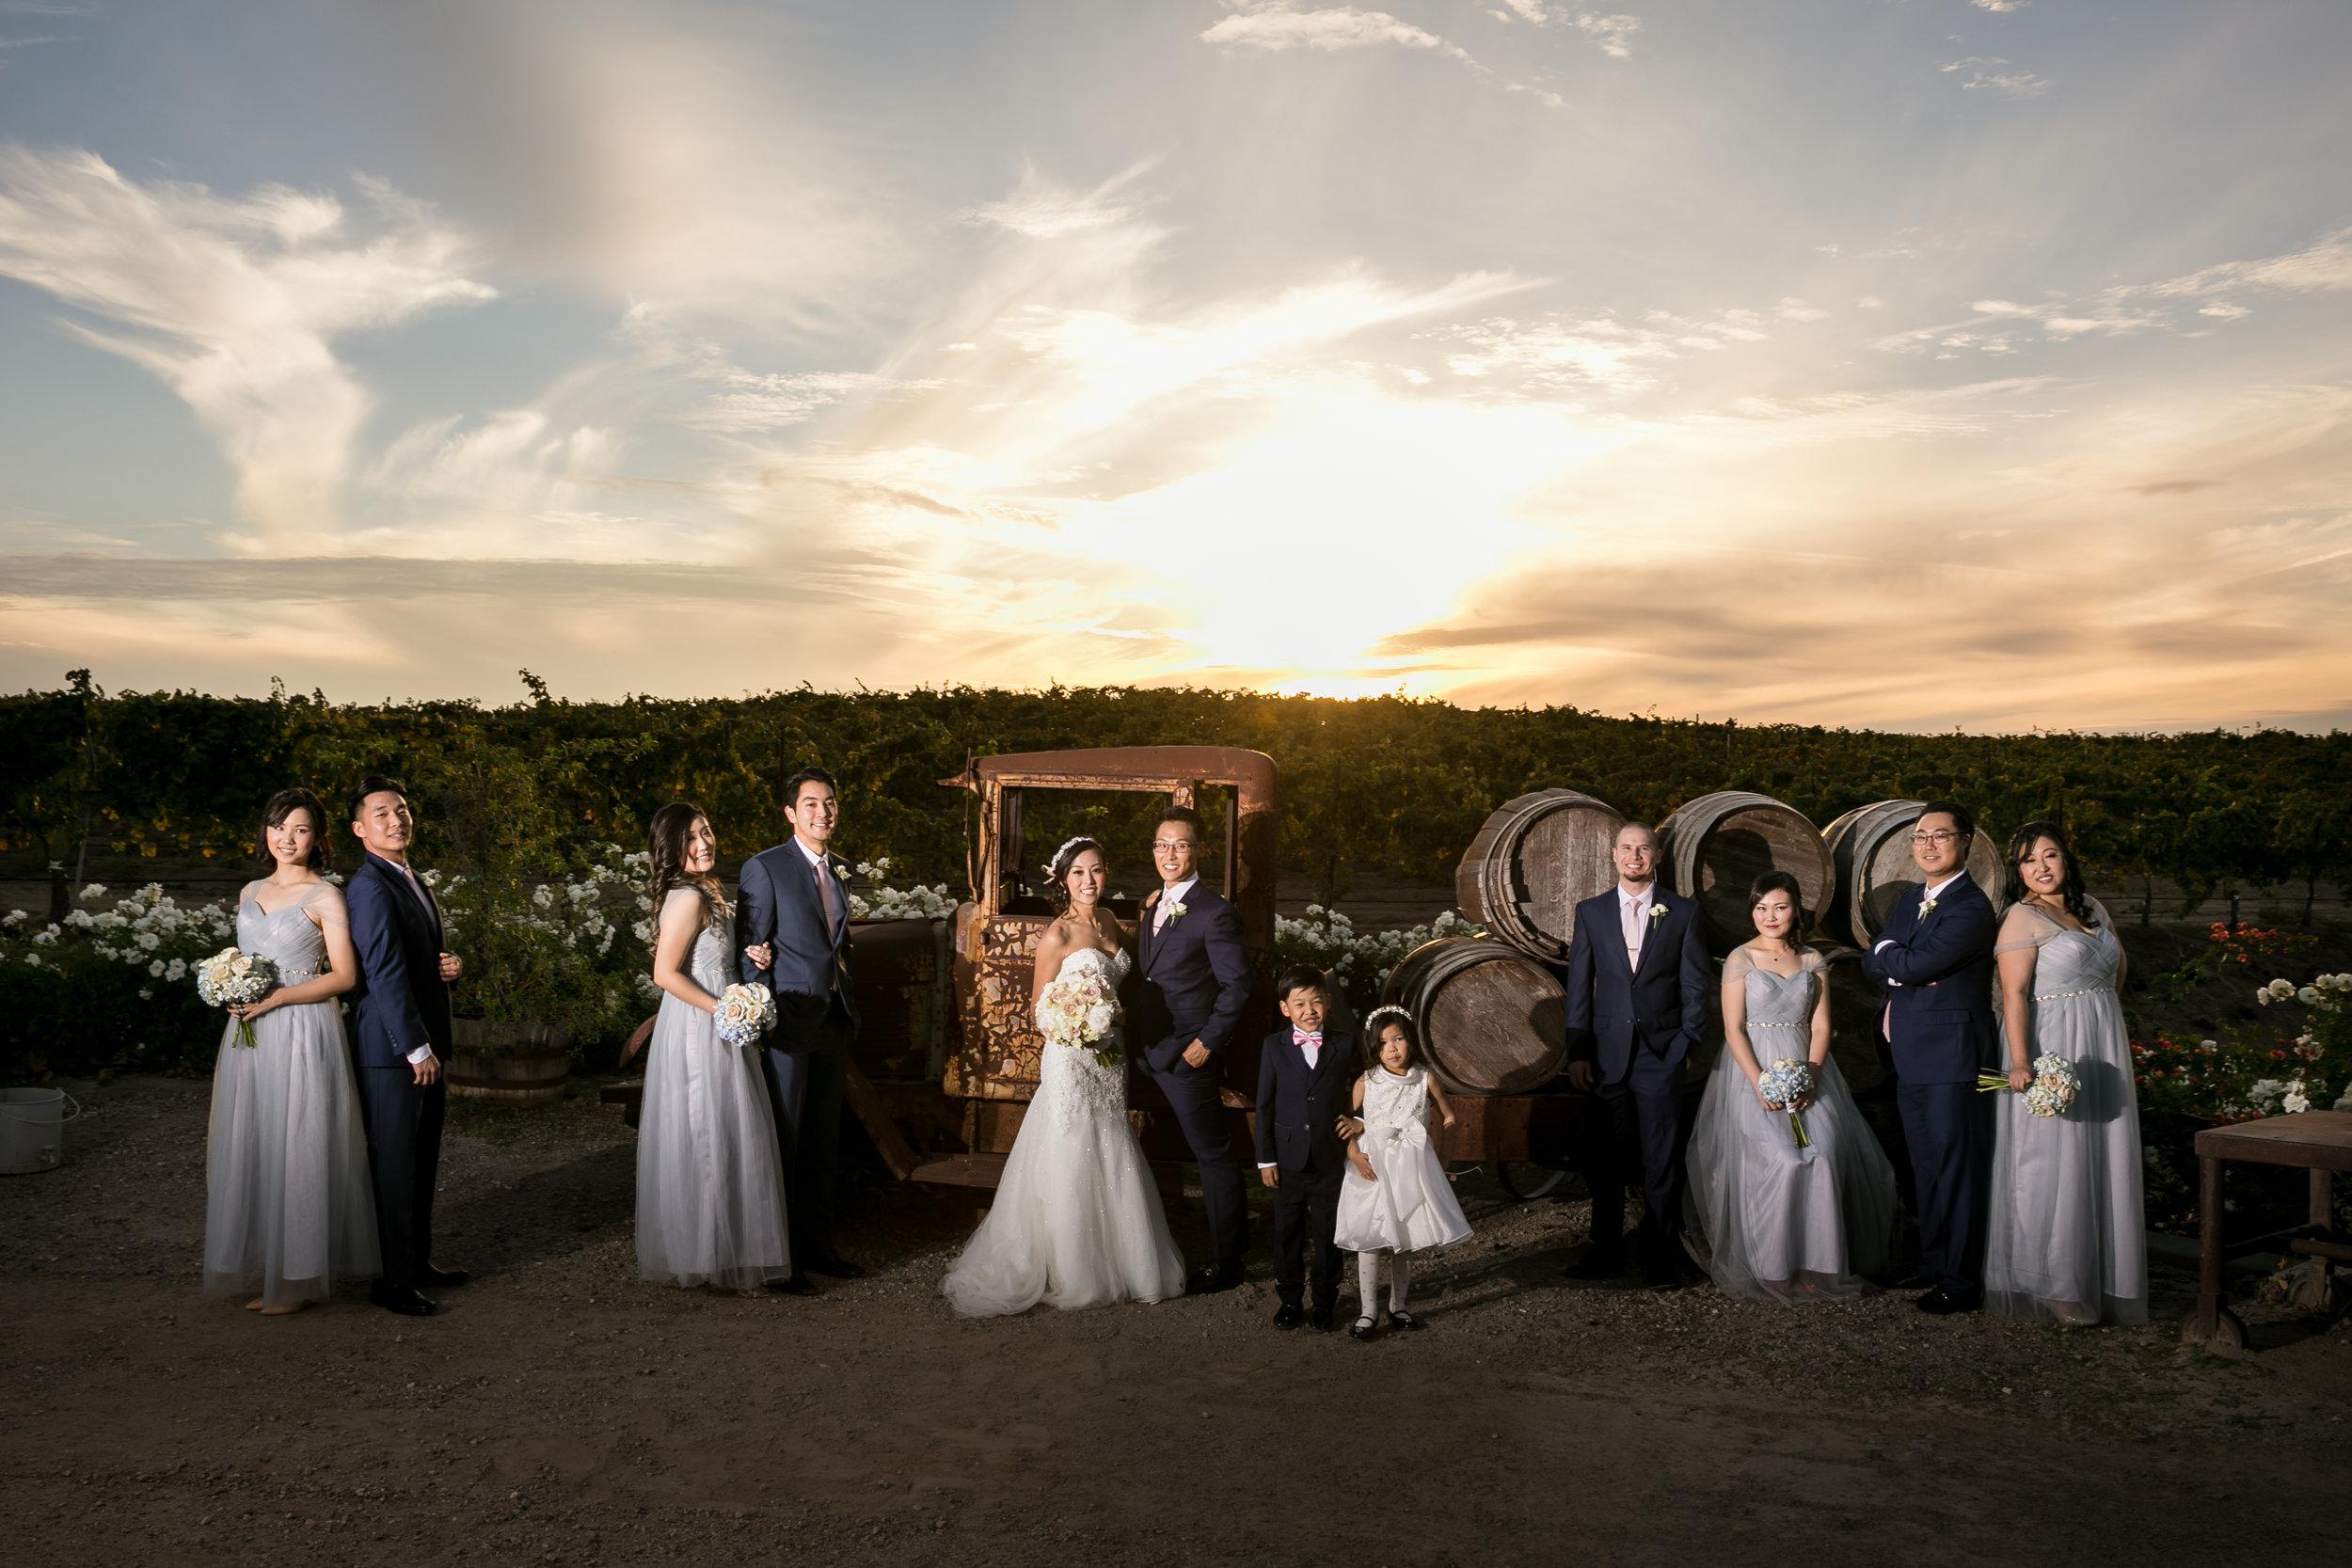 Bridal-Party-Villa-De-Amore-Temecula-Wedding-Photos.jpg